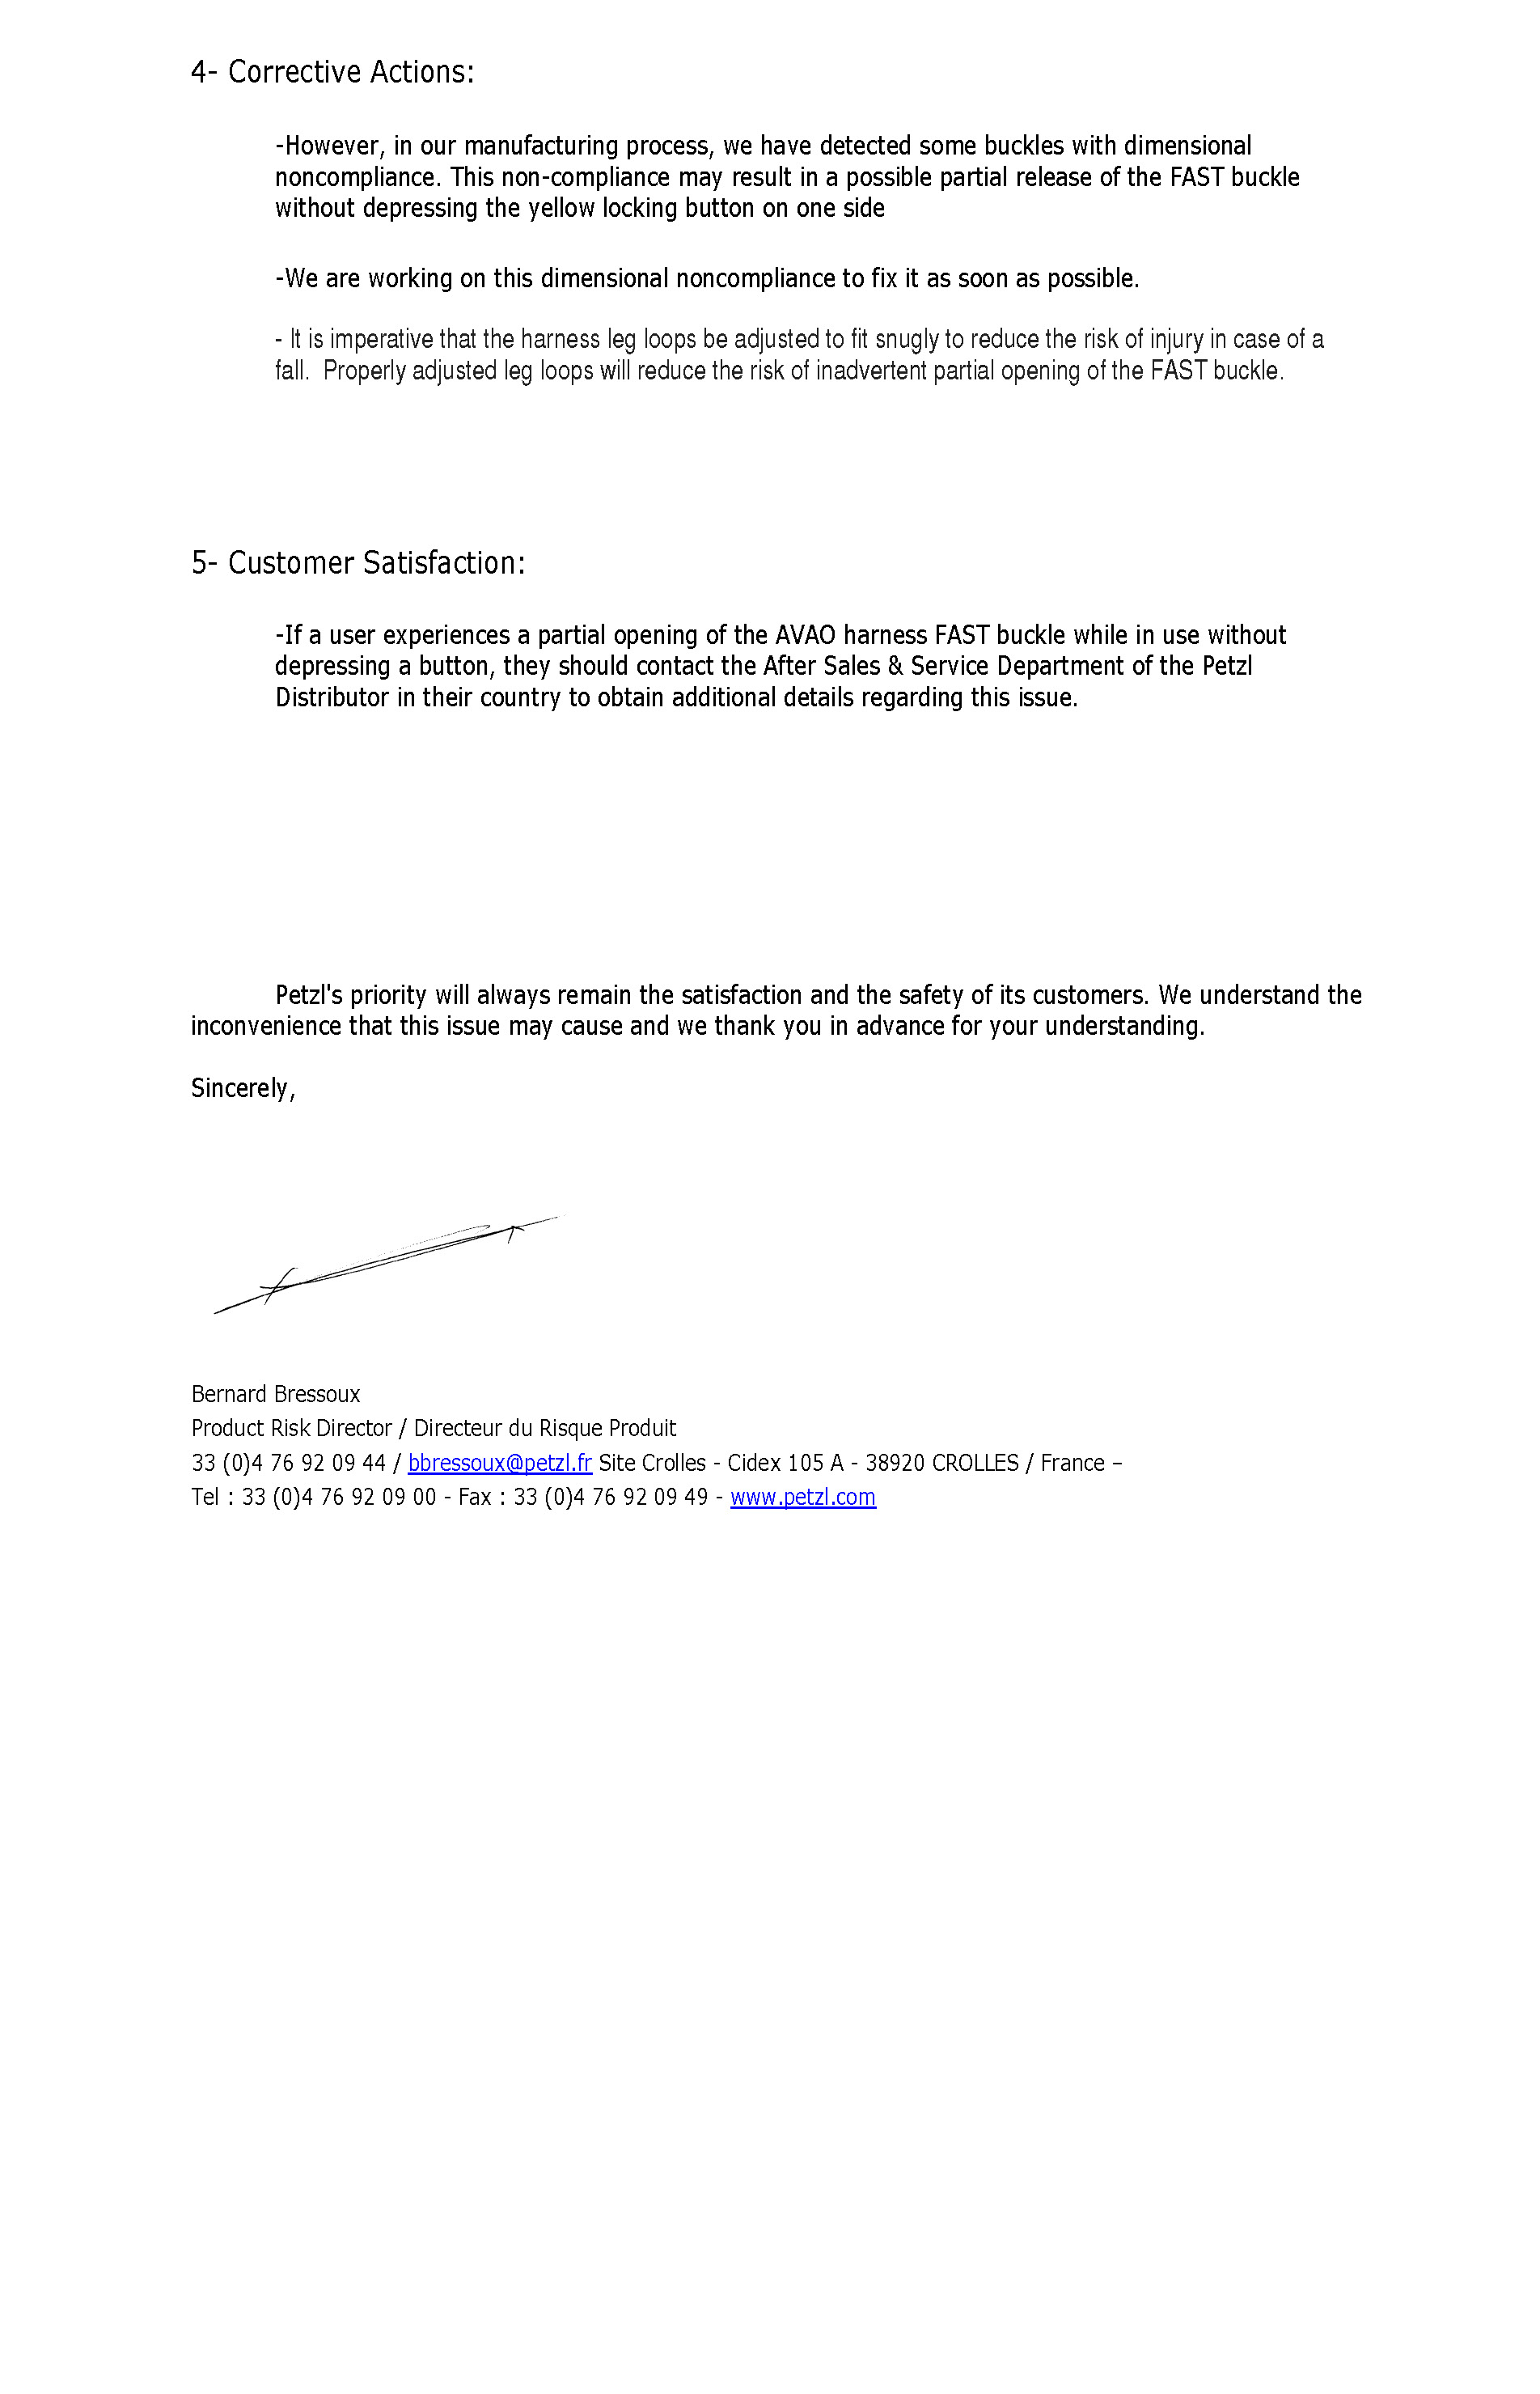 Petzl Statement Regarding AVAO BOD FAST buckle